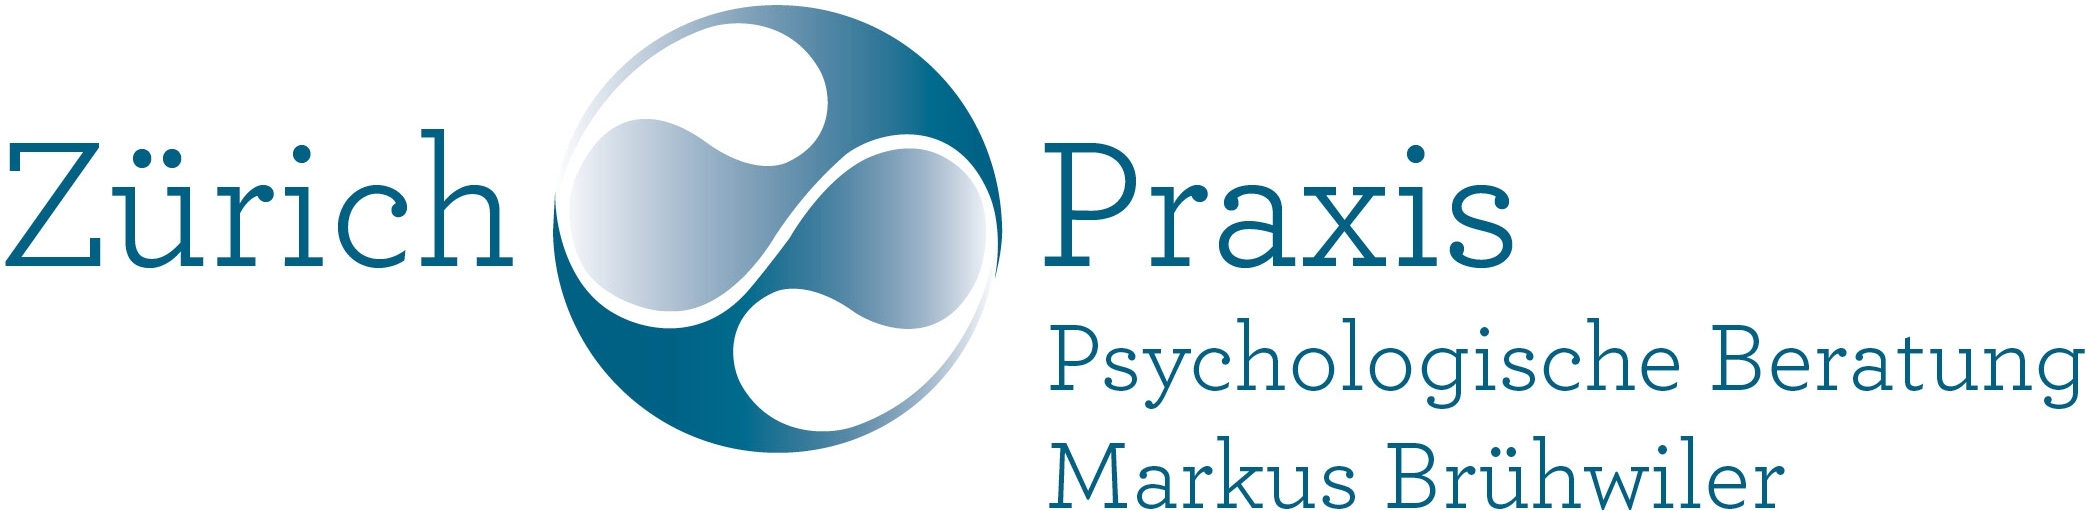 Logo Zürich Praxis - Psychologische Beratung Markus Brühwiler